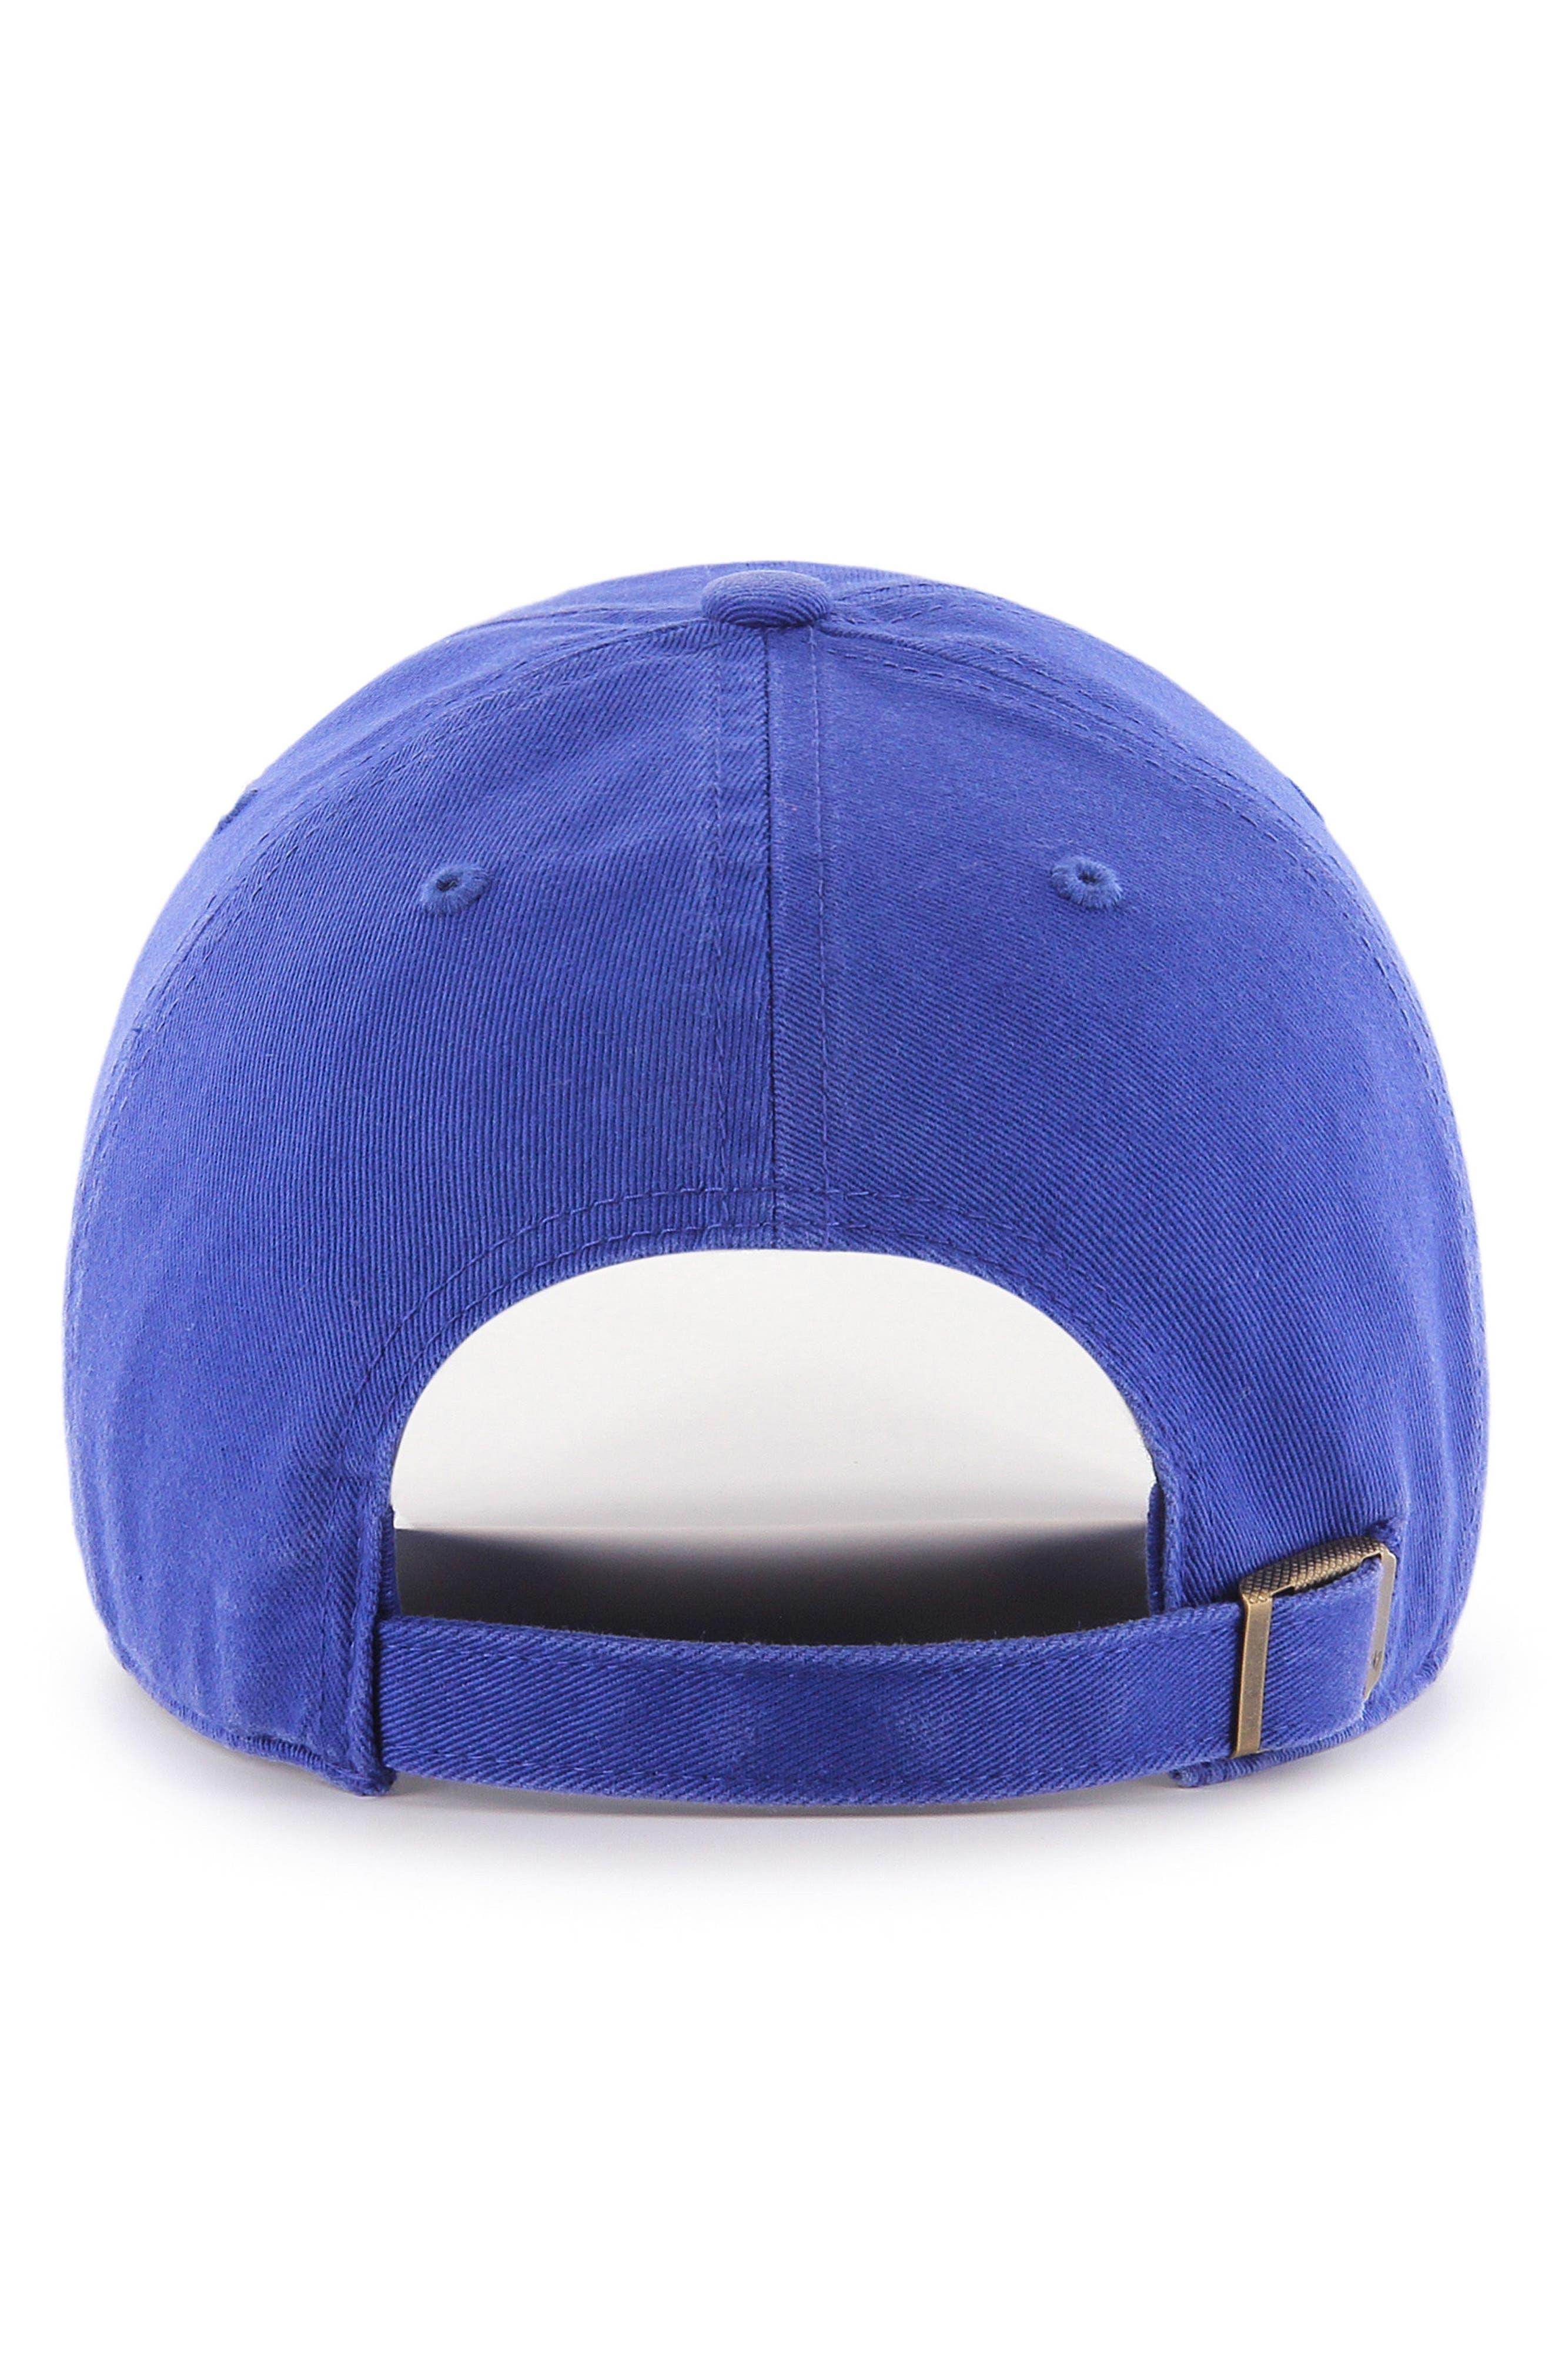 MLB Cooperstown Logo Ball Cap,                             Alternate thumbnail 19, color,